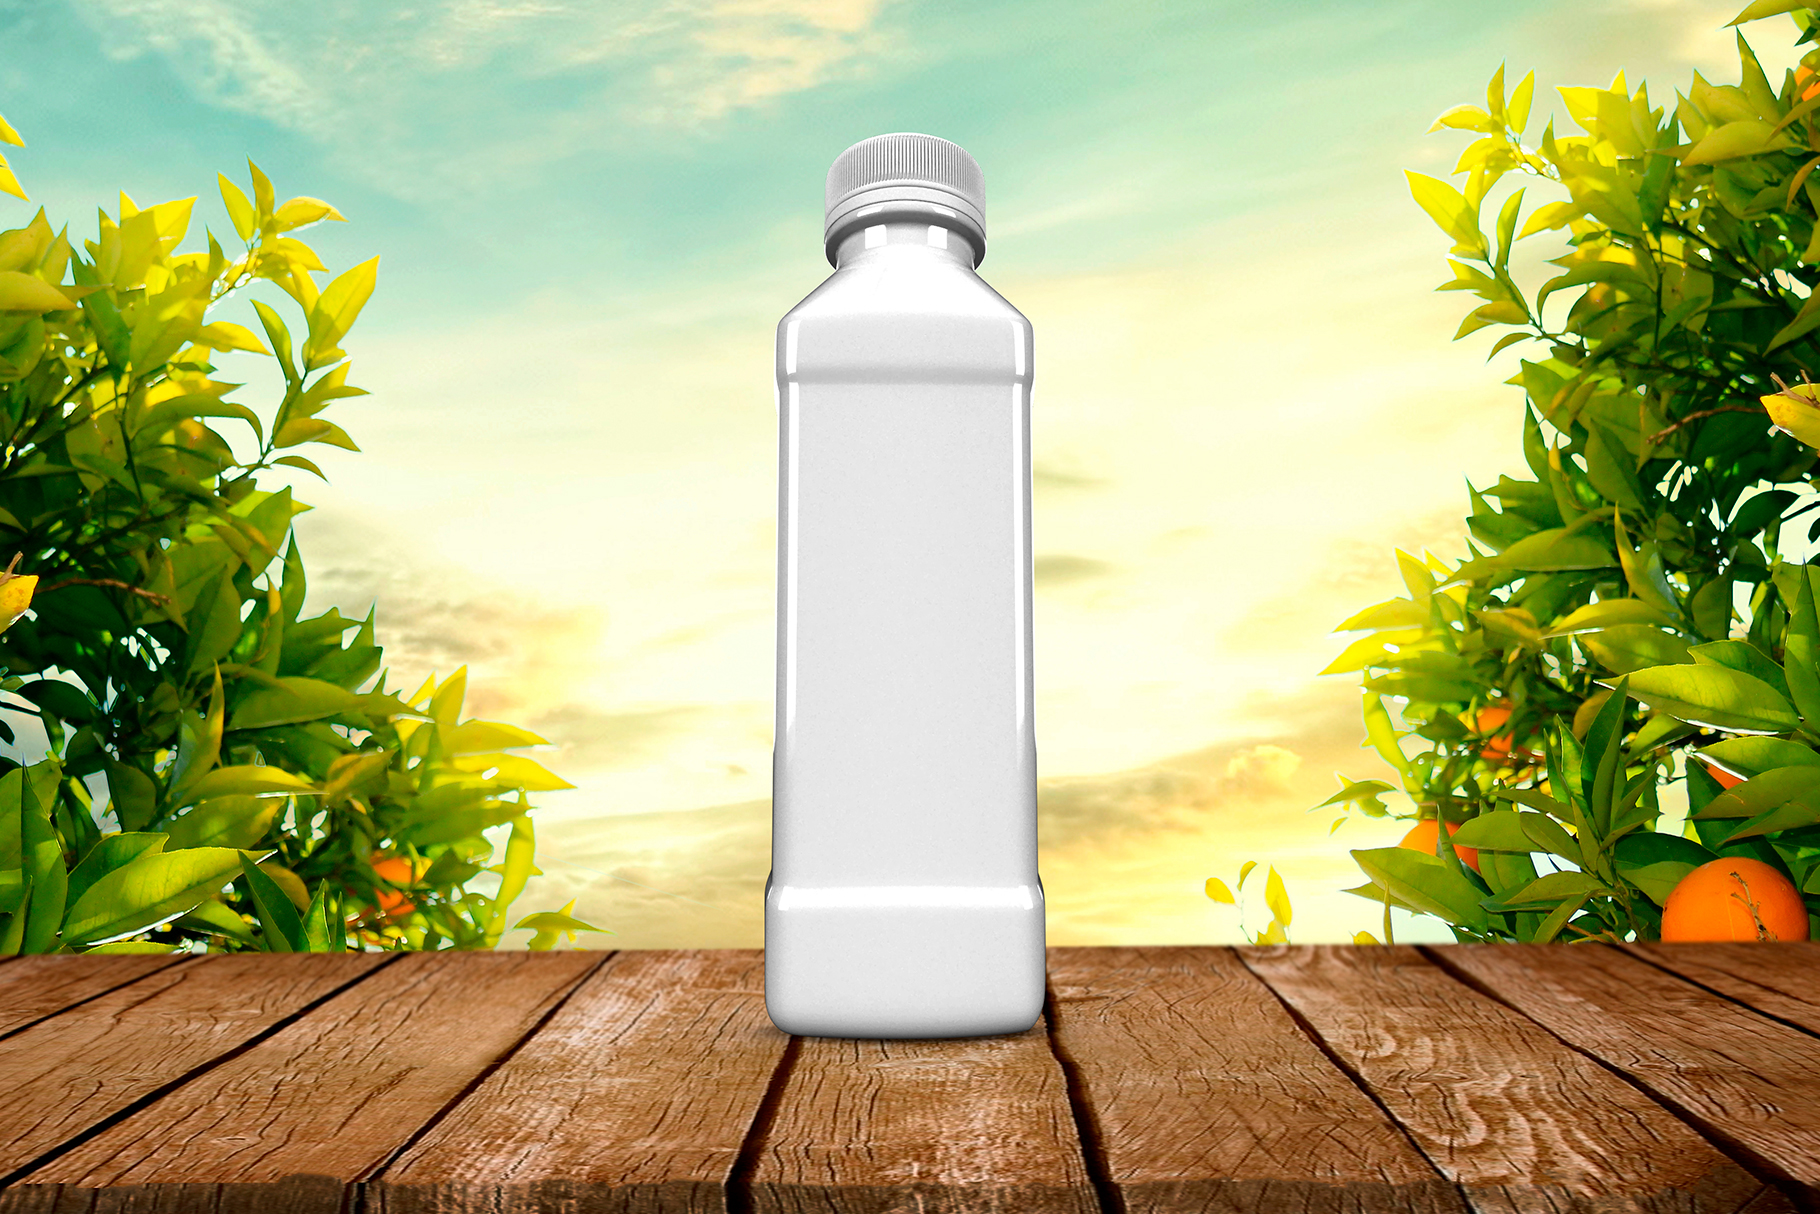 Bottle Juice Mockup Advertising example image 8